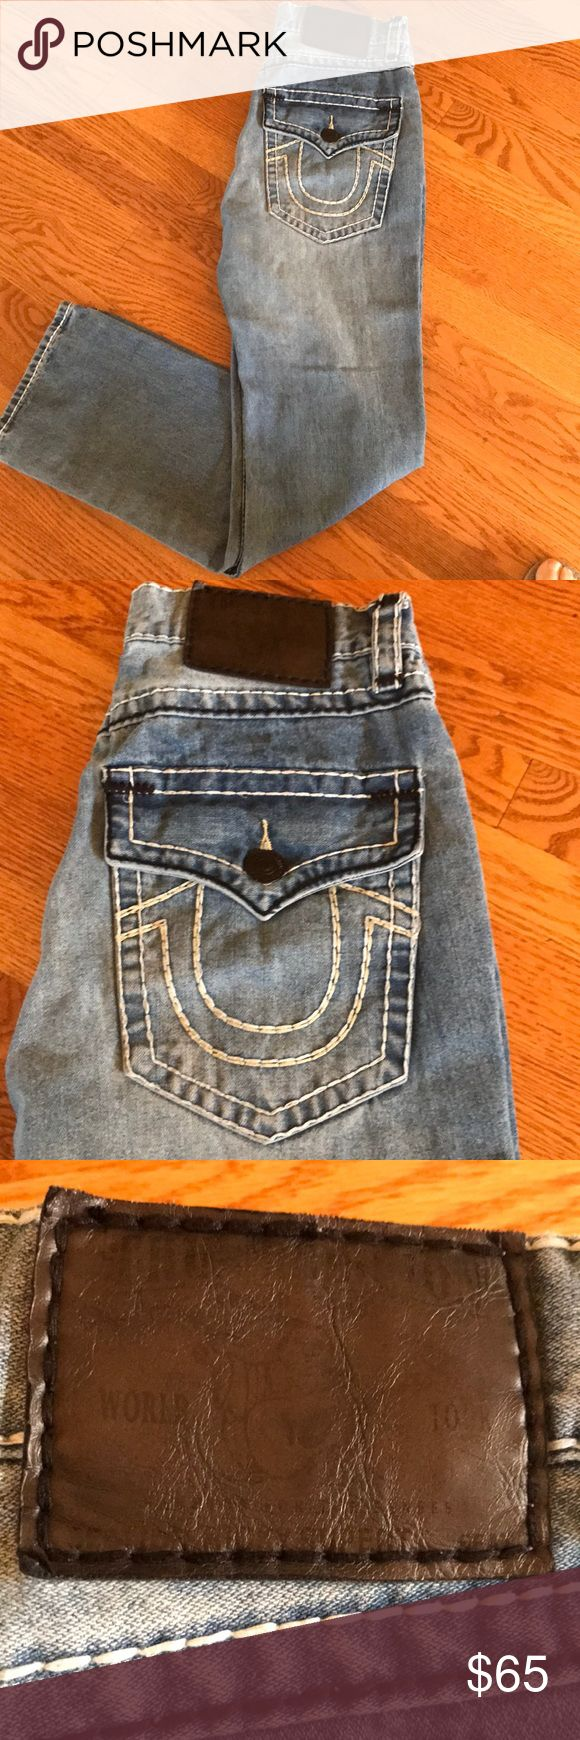 True Religion jeans Stone washed True Religion jeans. NEVER WORN!!! Authentic. True Religion Jeans Straight Leg